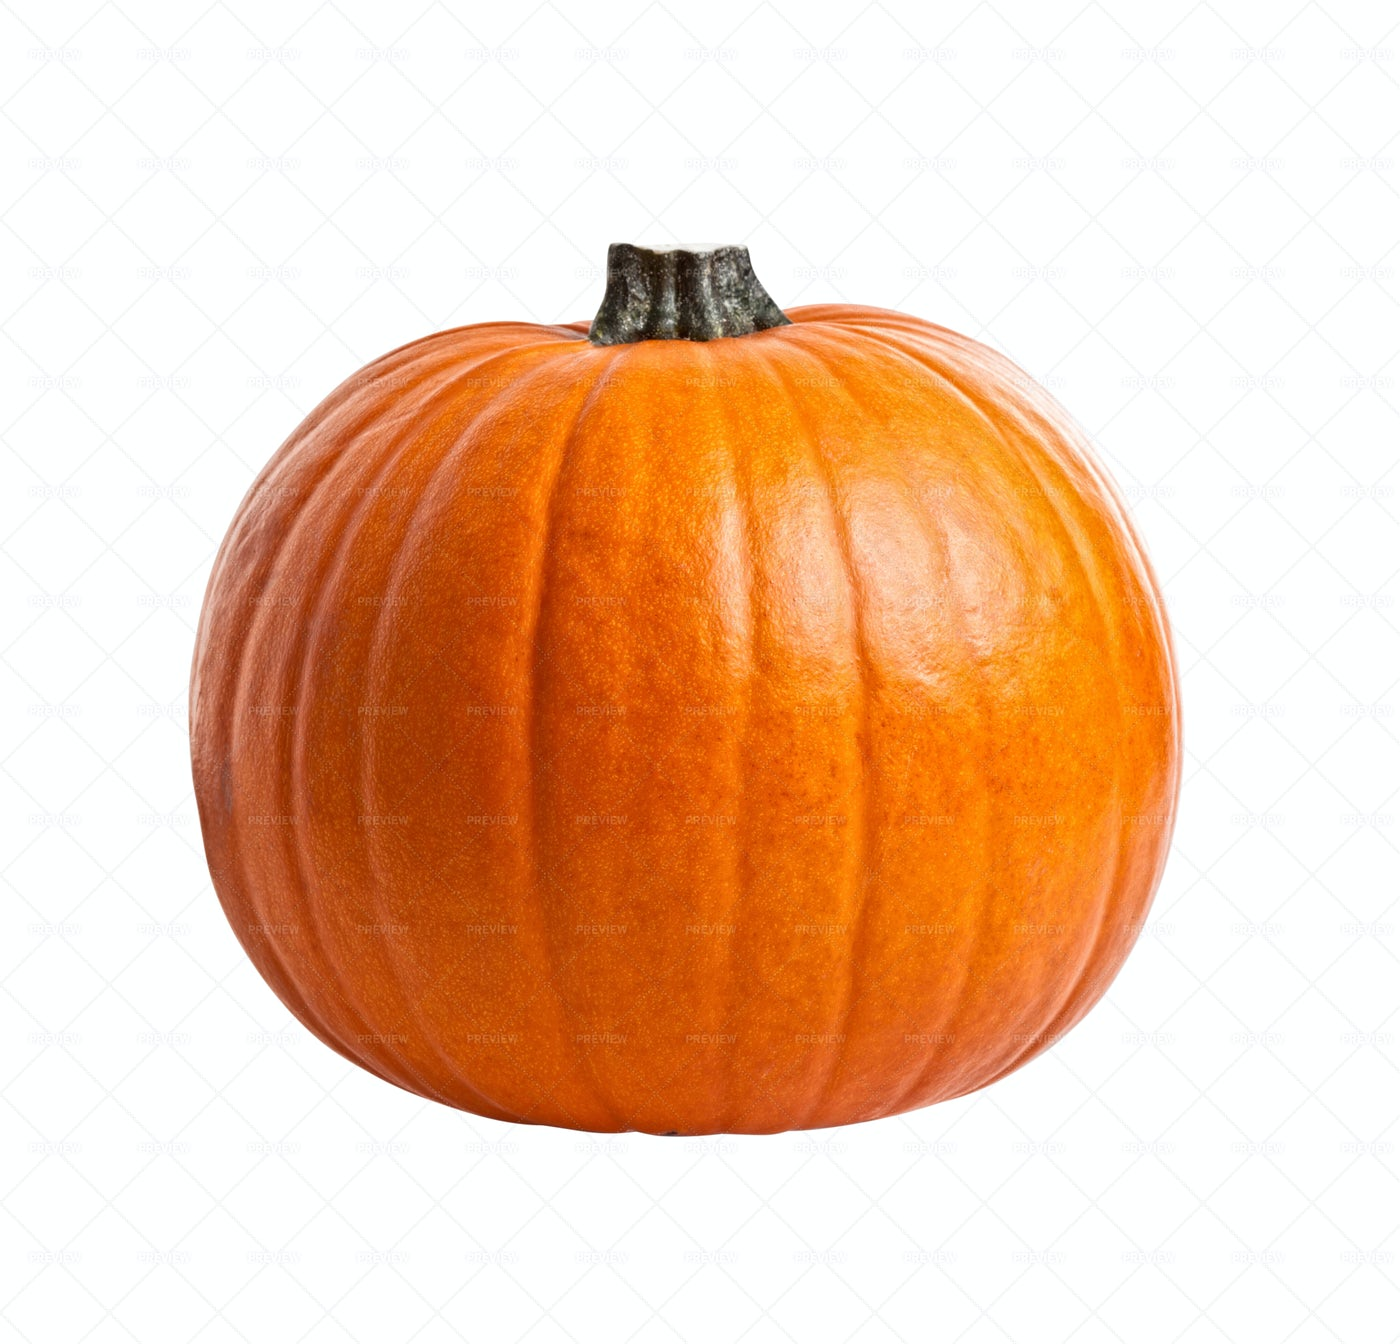 Pumpkin Isolated On White: Stock Photos